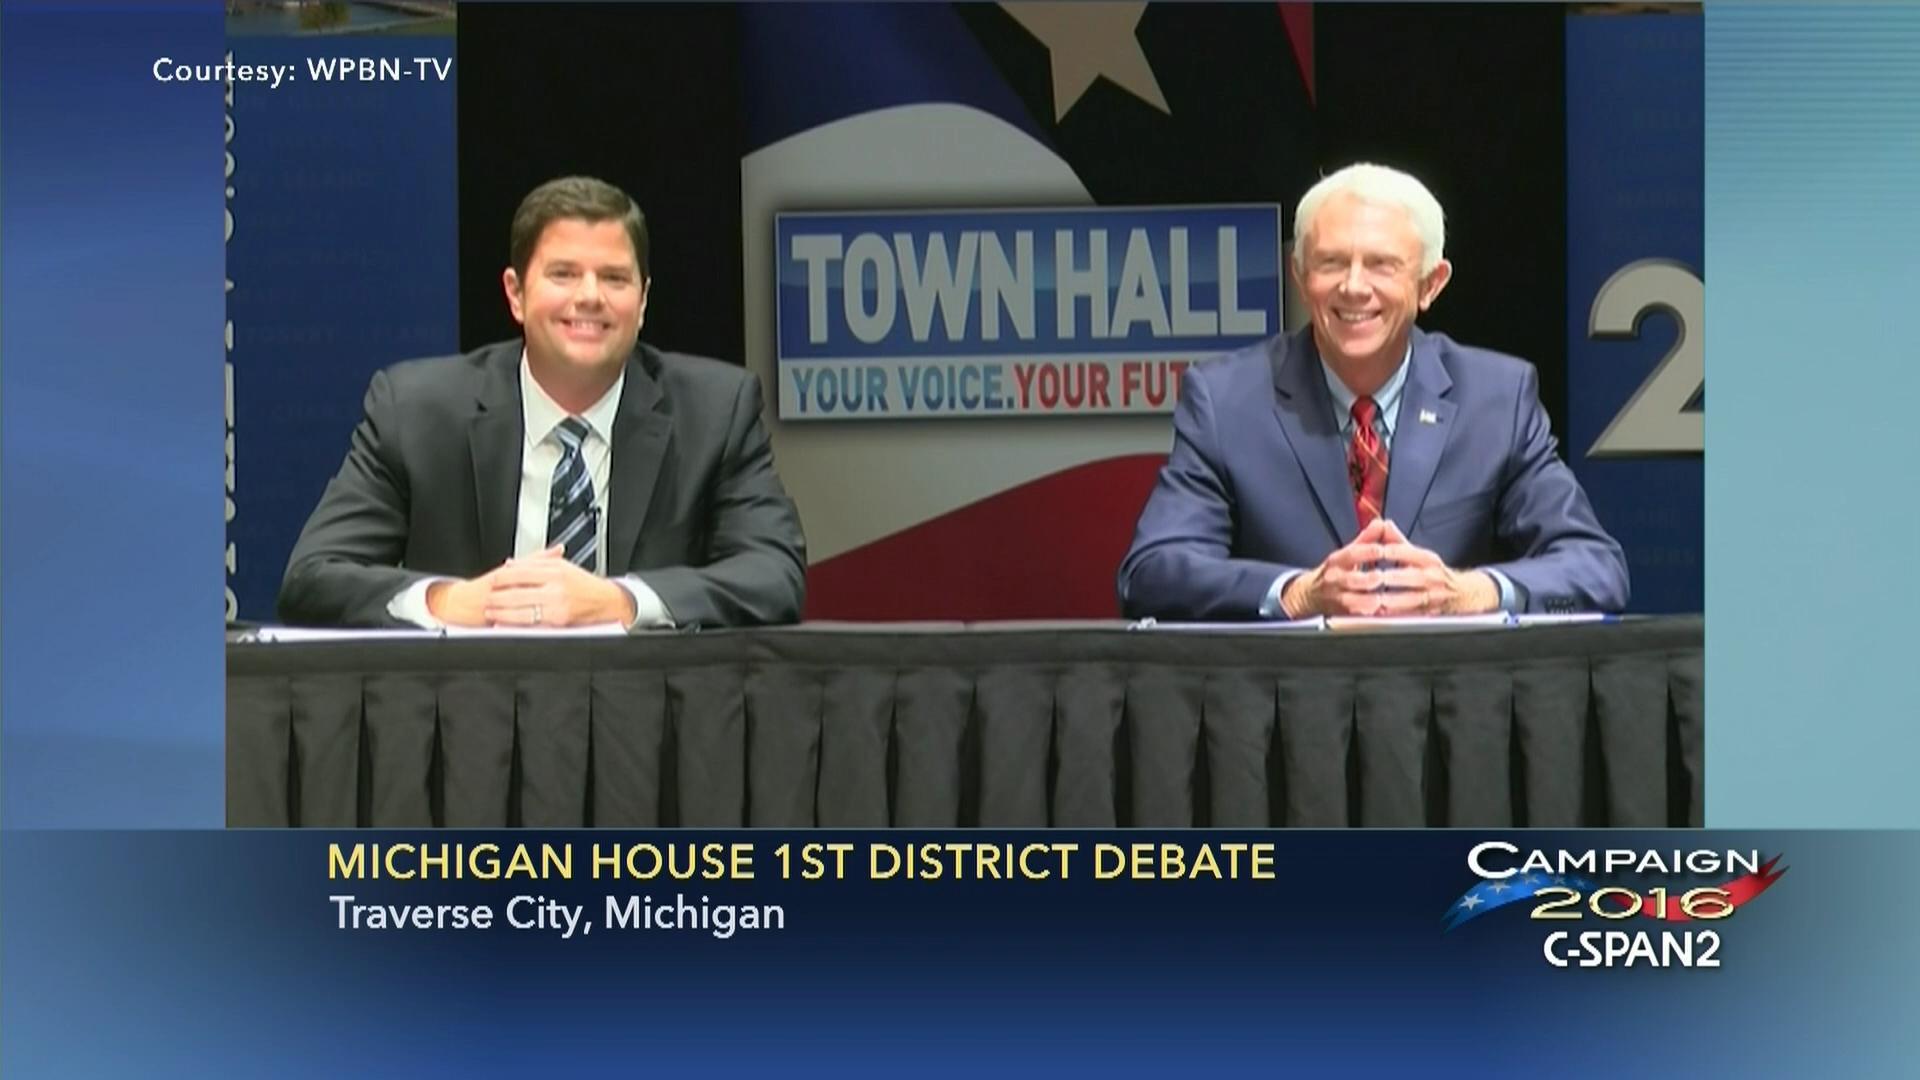 Michigan 1st Congressional District Debate